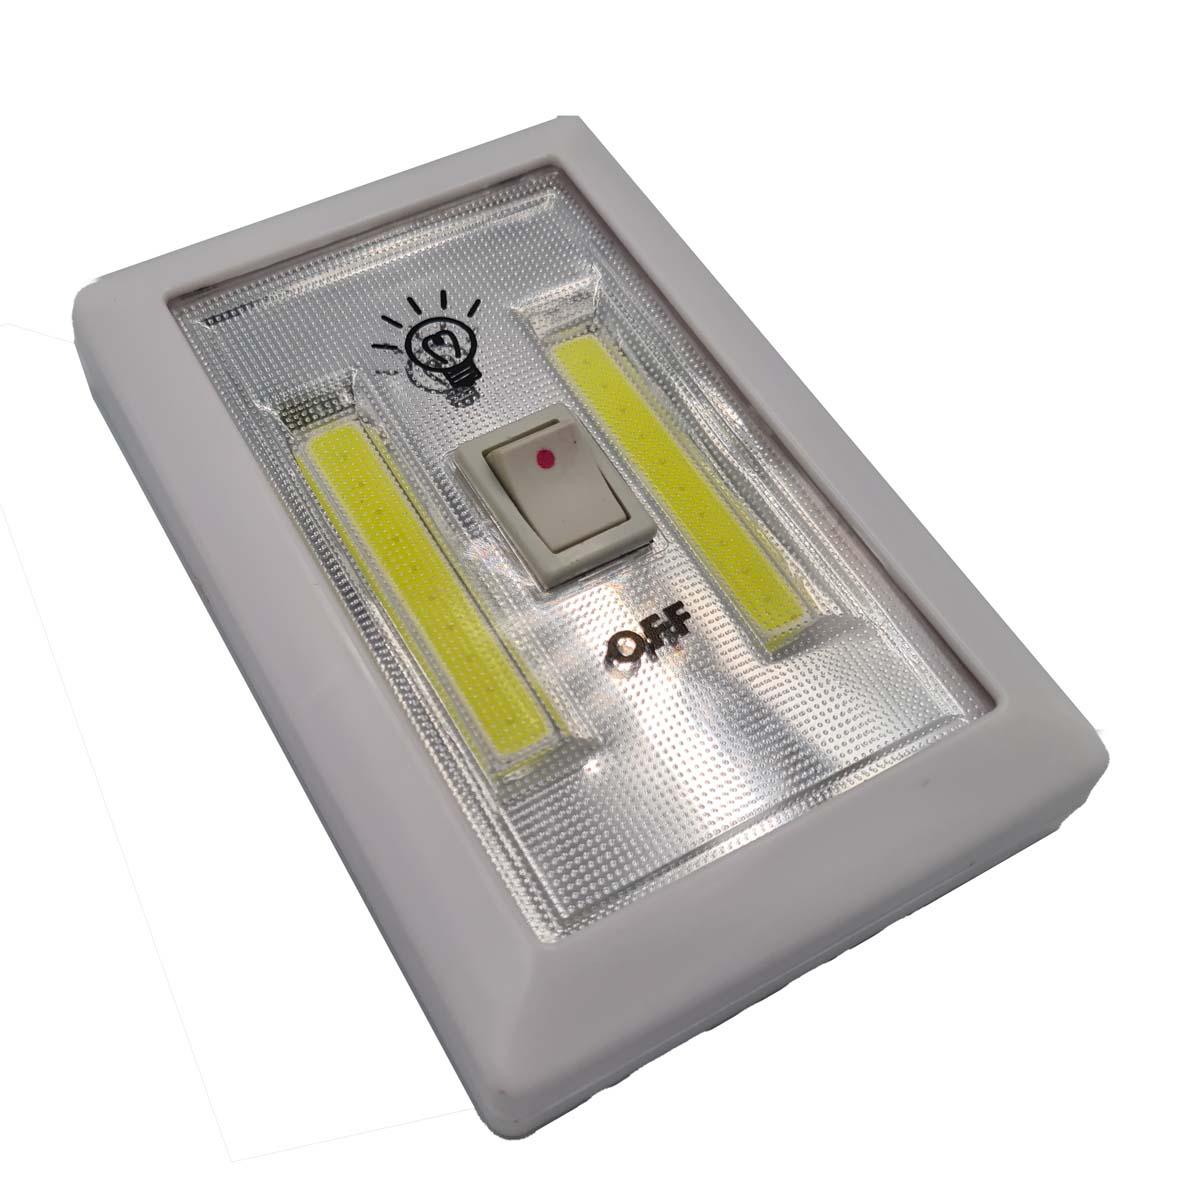 Luminária LED Portátil Interruptor Switch Ligth 3w WH2015